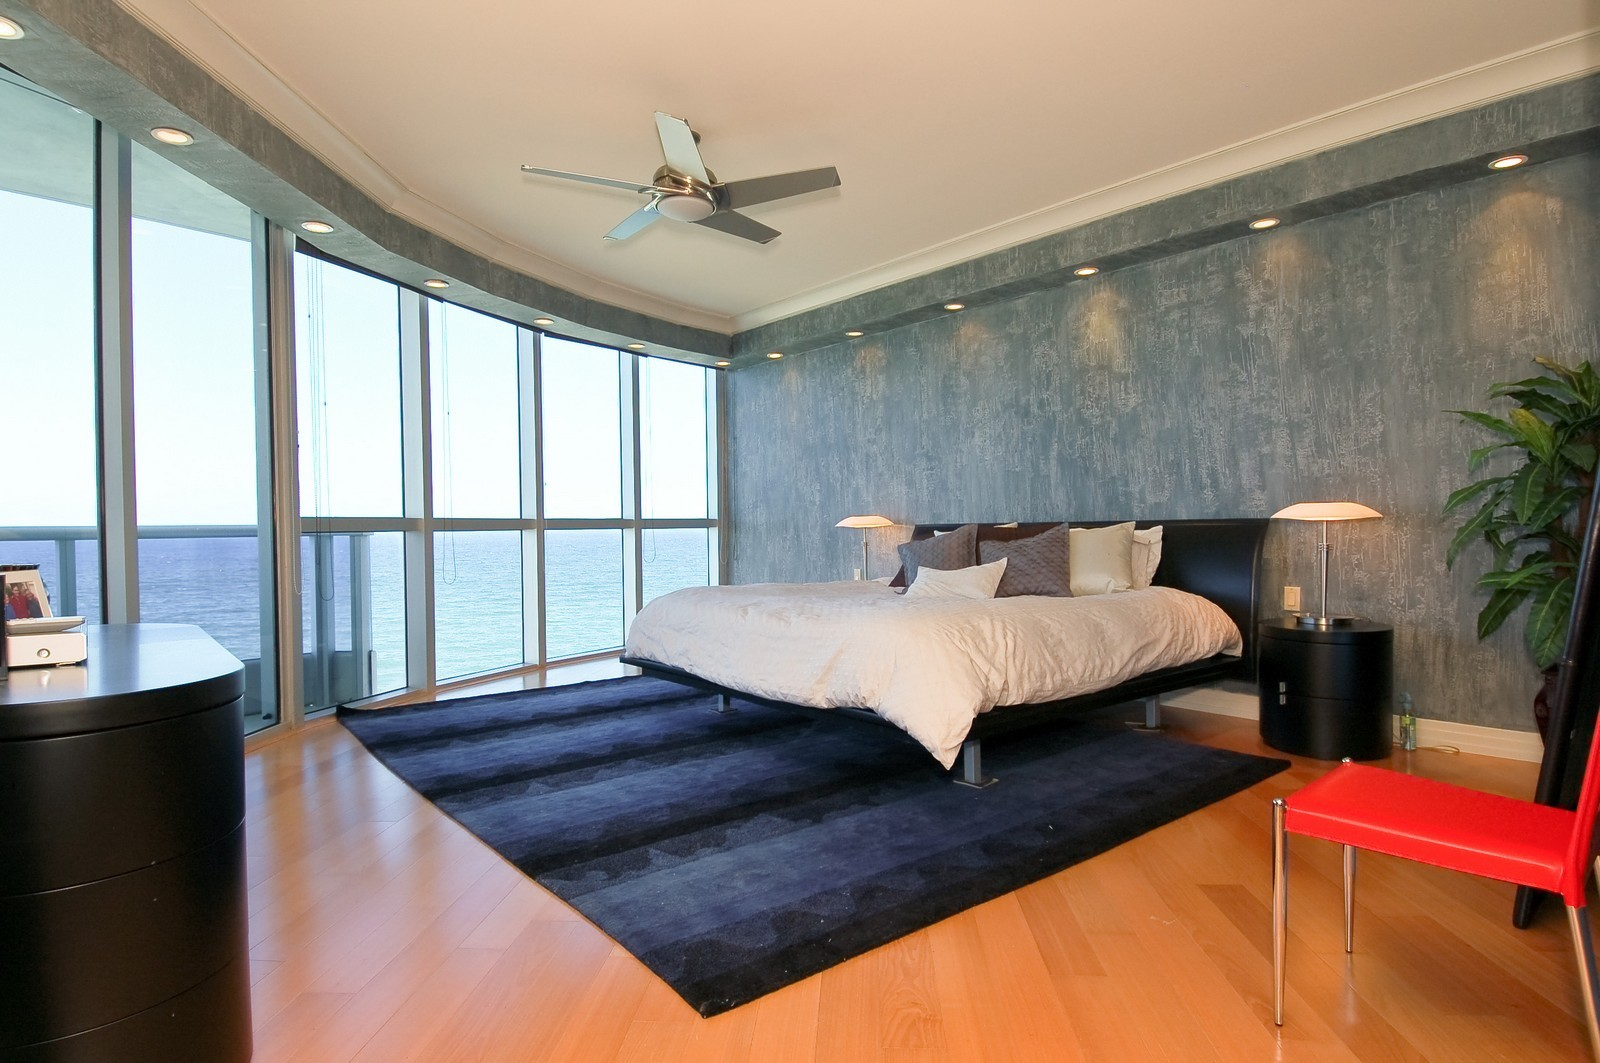 Real Estate Photography - 1600 S Ocean Blvd, Apt 802, Pompano Beach, FL, 33062 - Master Bedroom